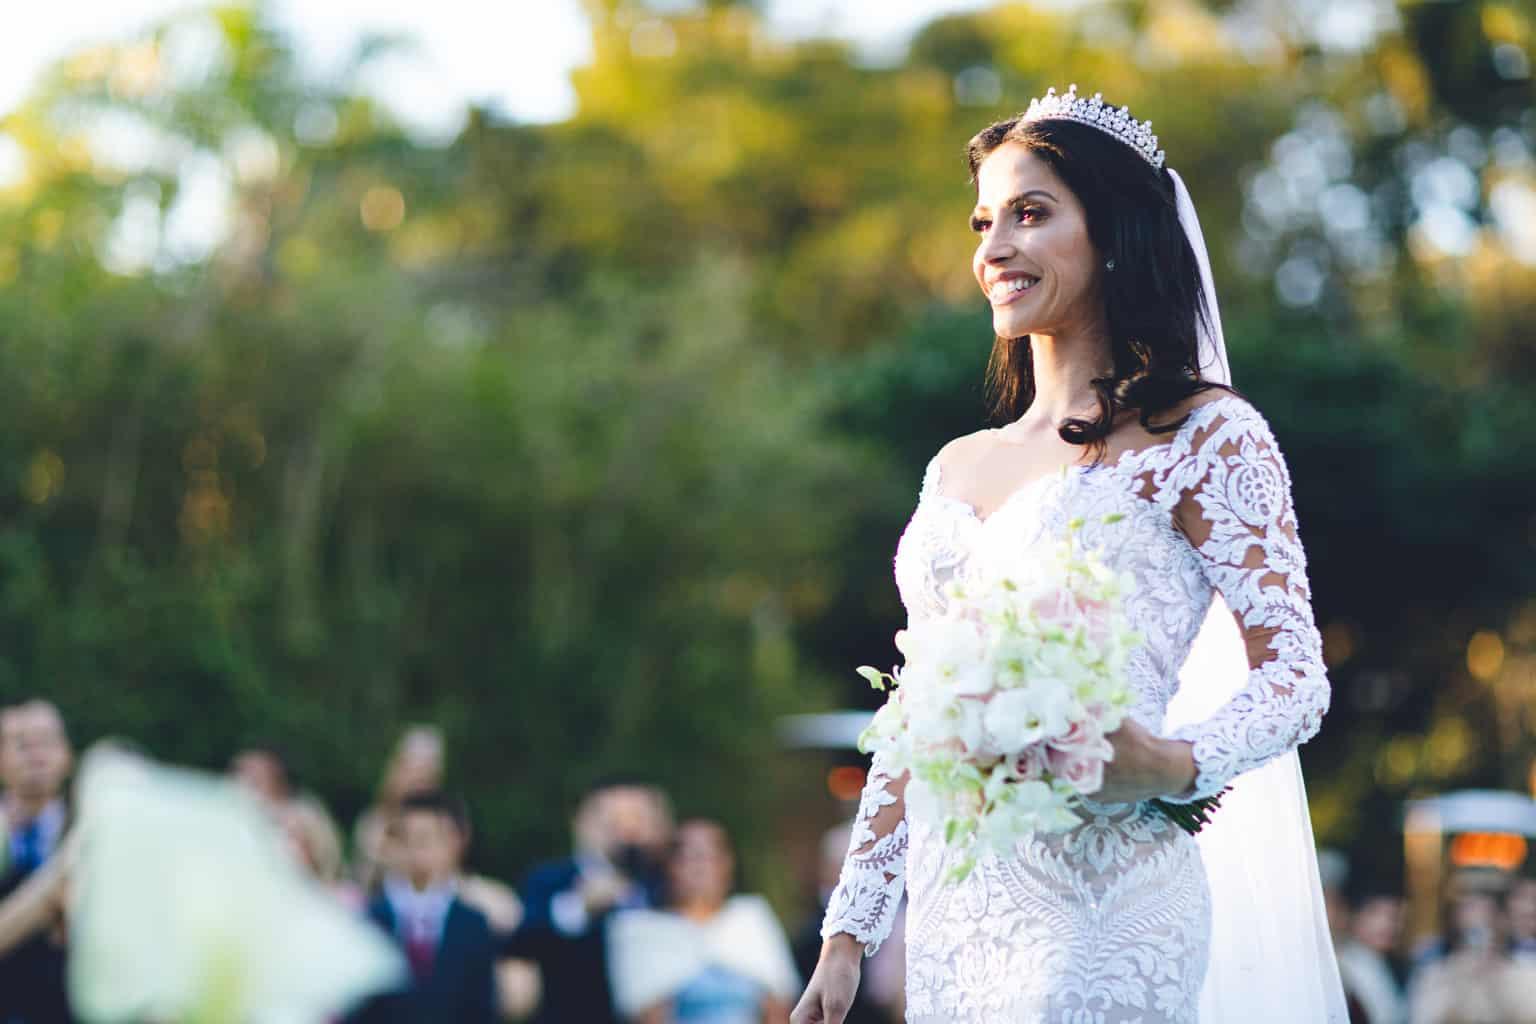 Casamento-de-Bianka-e-Nilo-Fotografia-Marcelo-Schmoeller-SC-Alameda-Casa-Rosa-03082019_bianka-e-nilo_1243